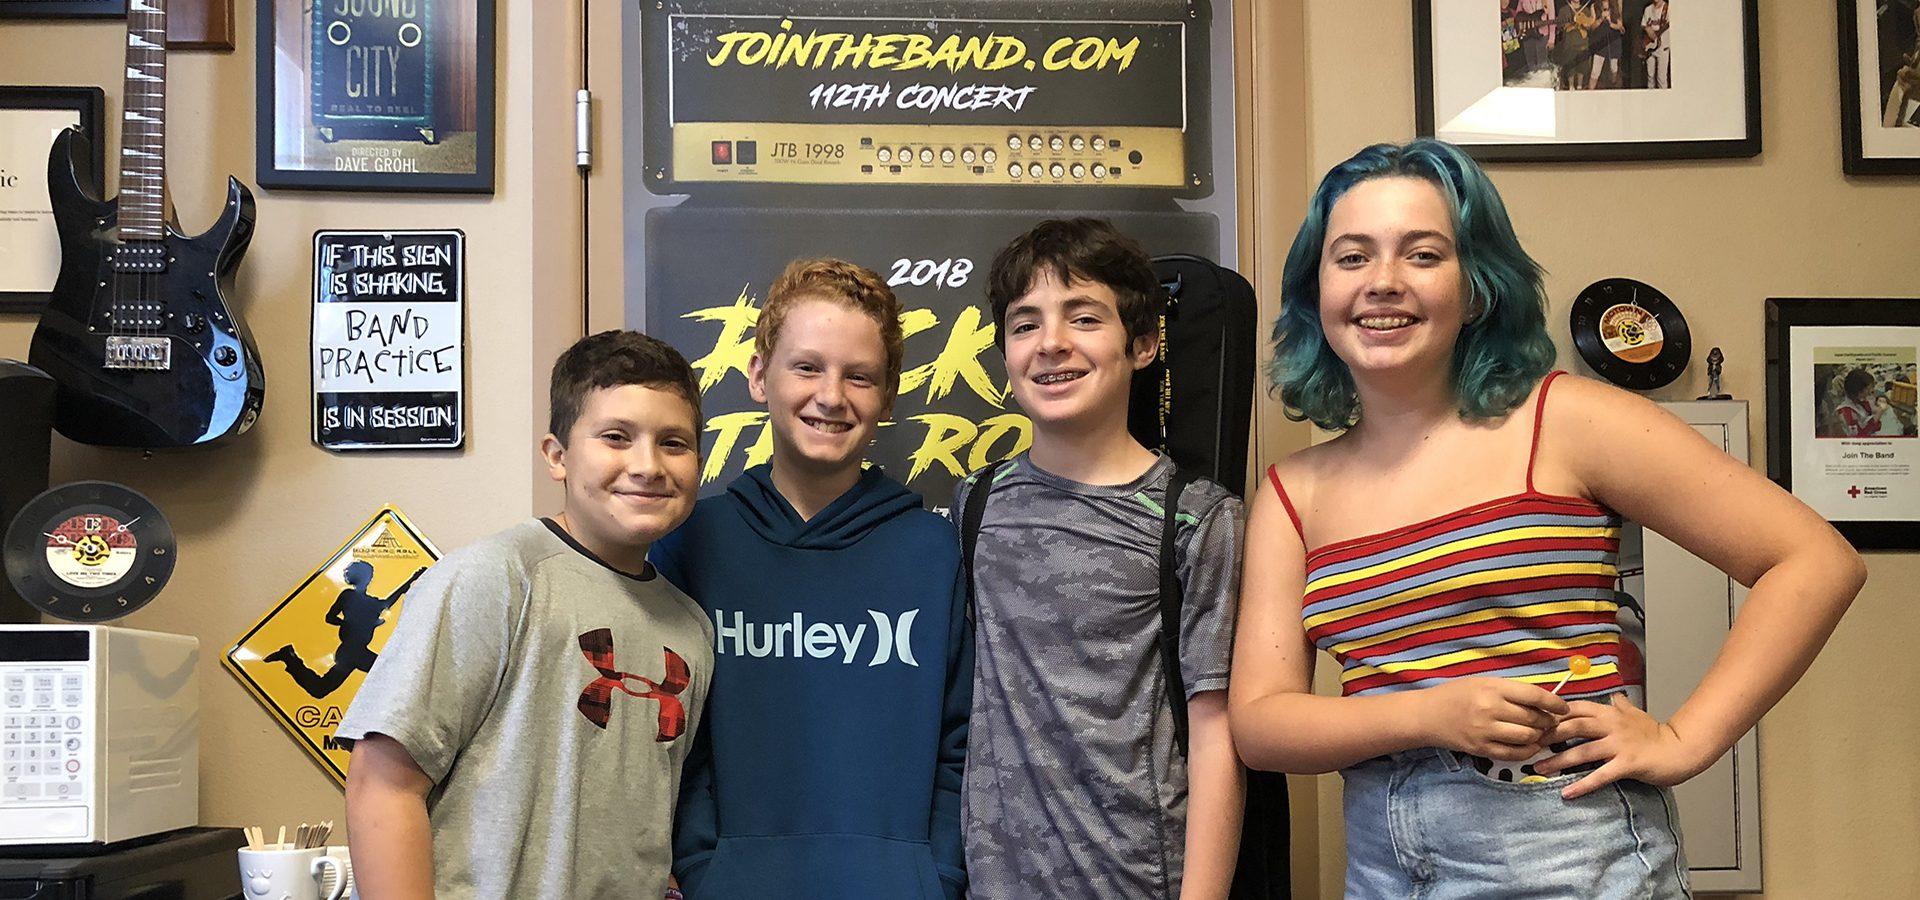 Rock Band Music Camp - Kids Band - Sherman Oaks, Los Angeles - Join The Band